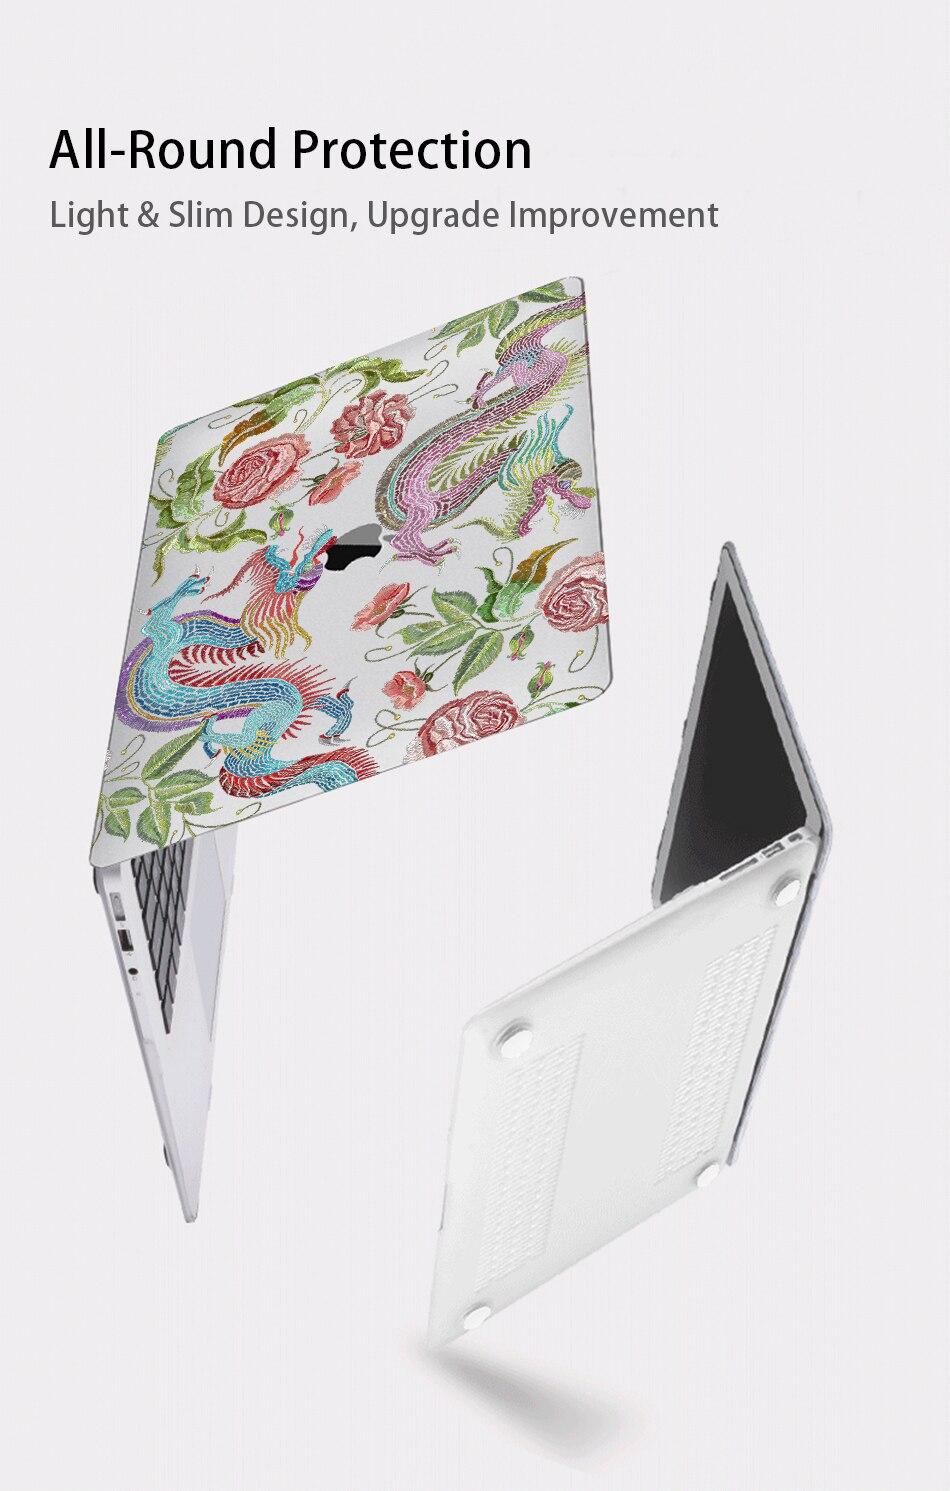 Macbook-官方店详情模板2019_03